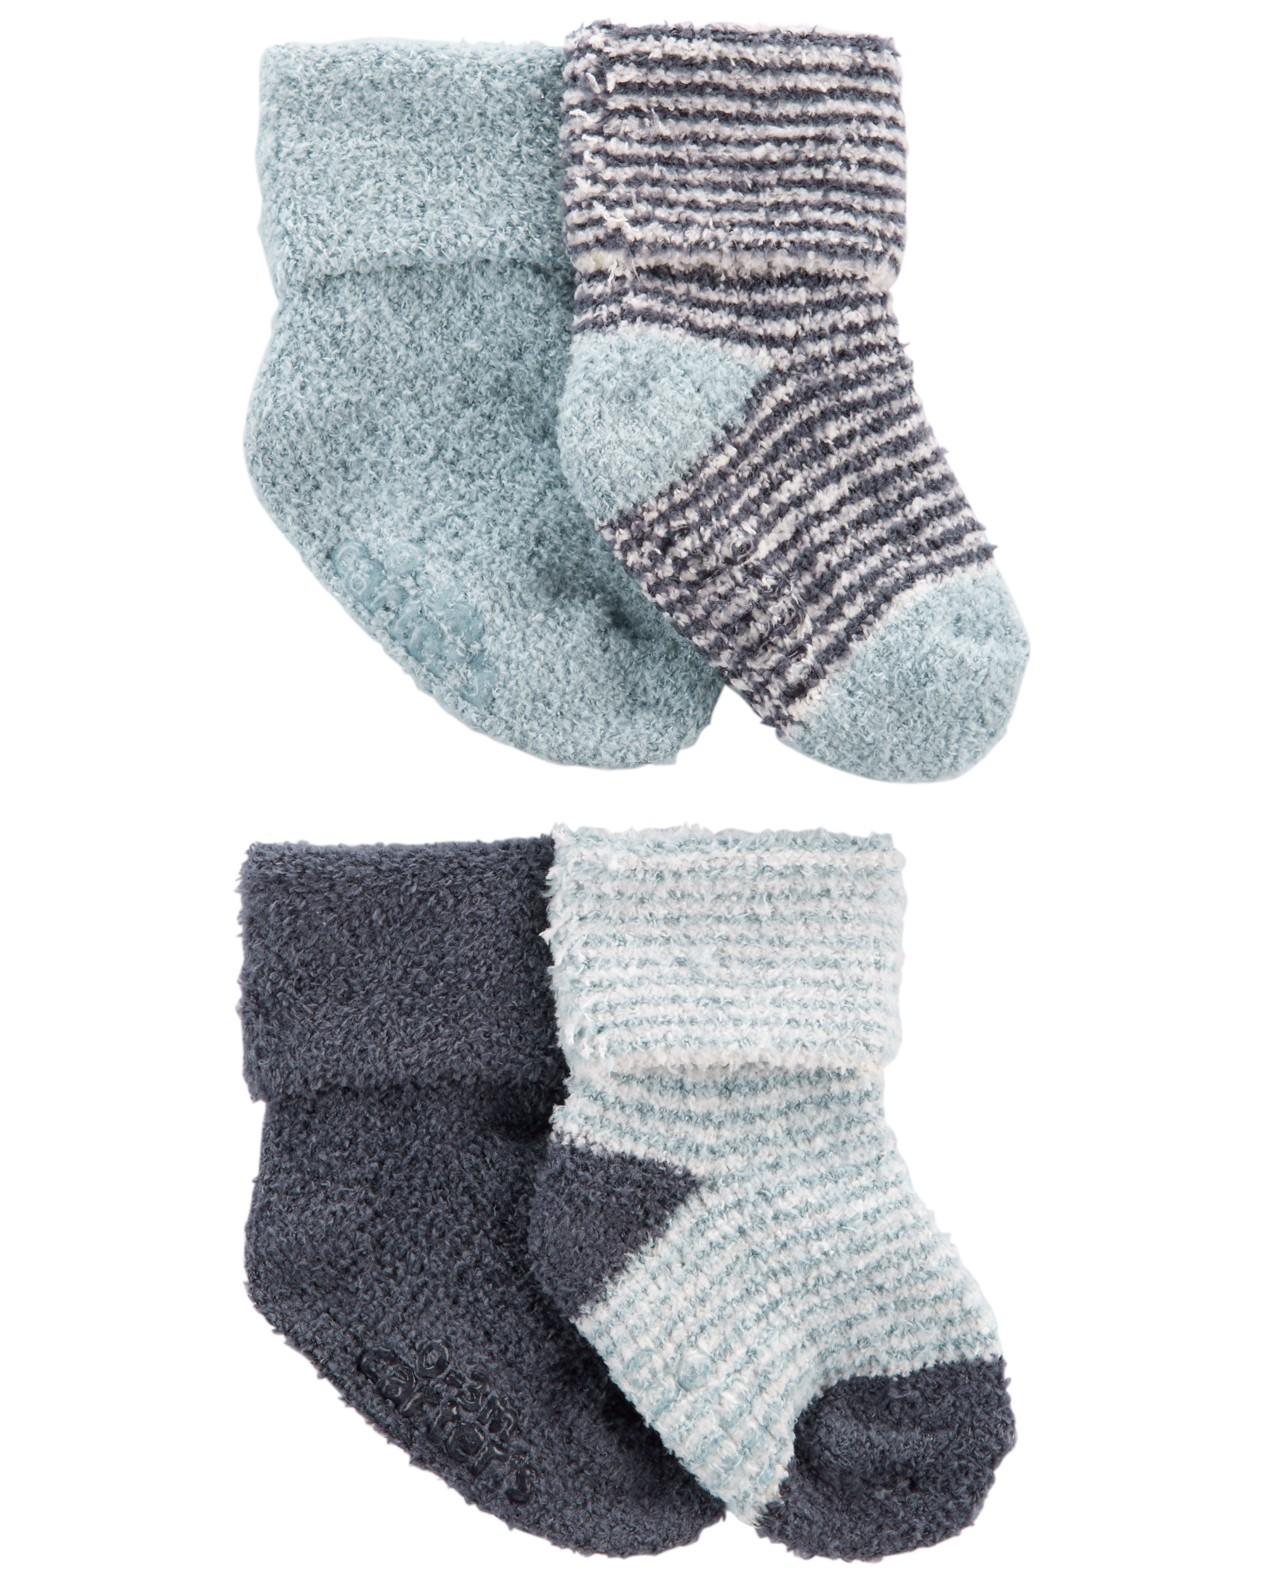 CARTER'S Ponožky Stripes Blue chlapec LBB 4ks 12-24m